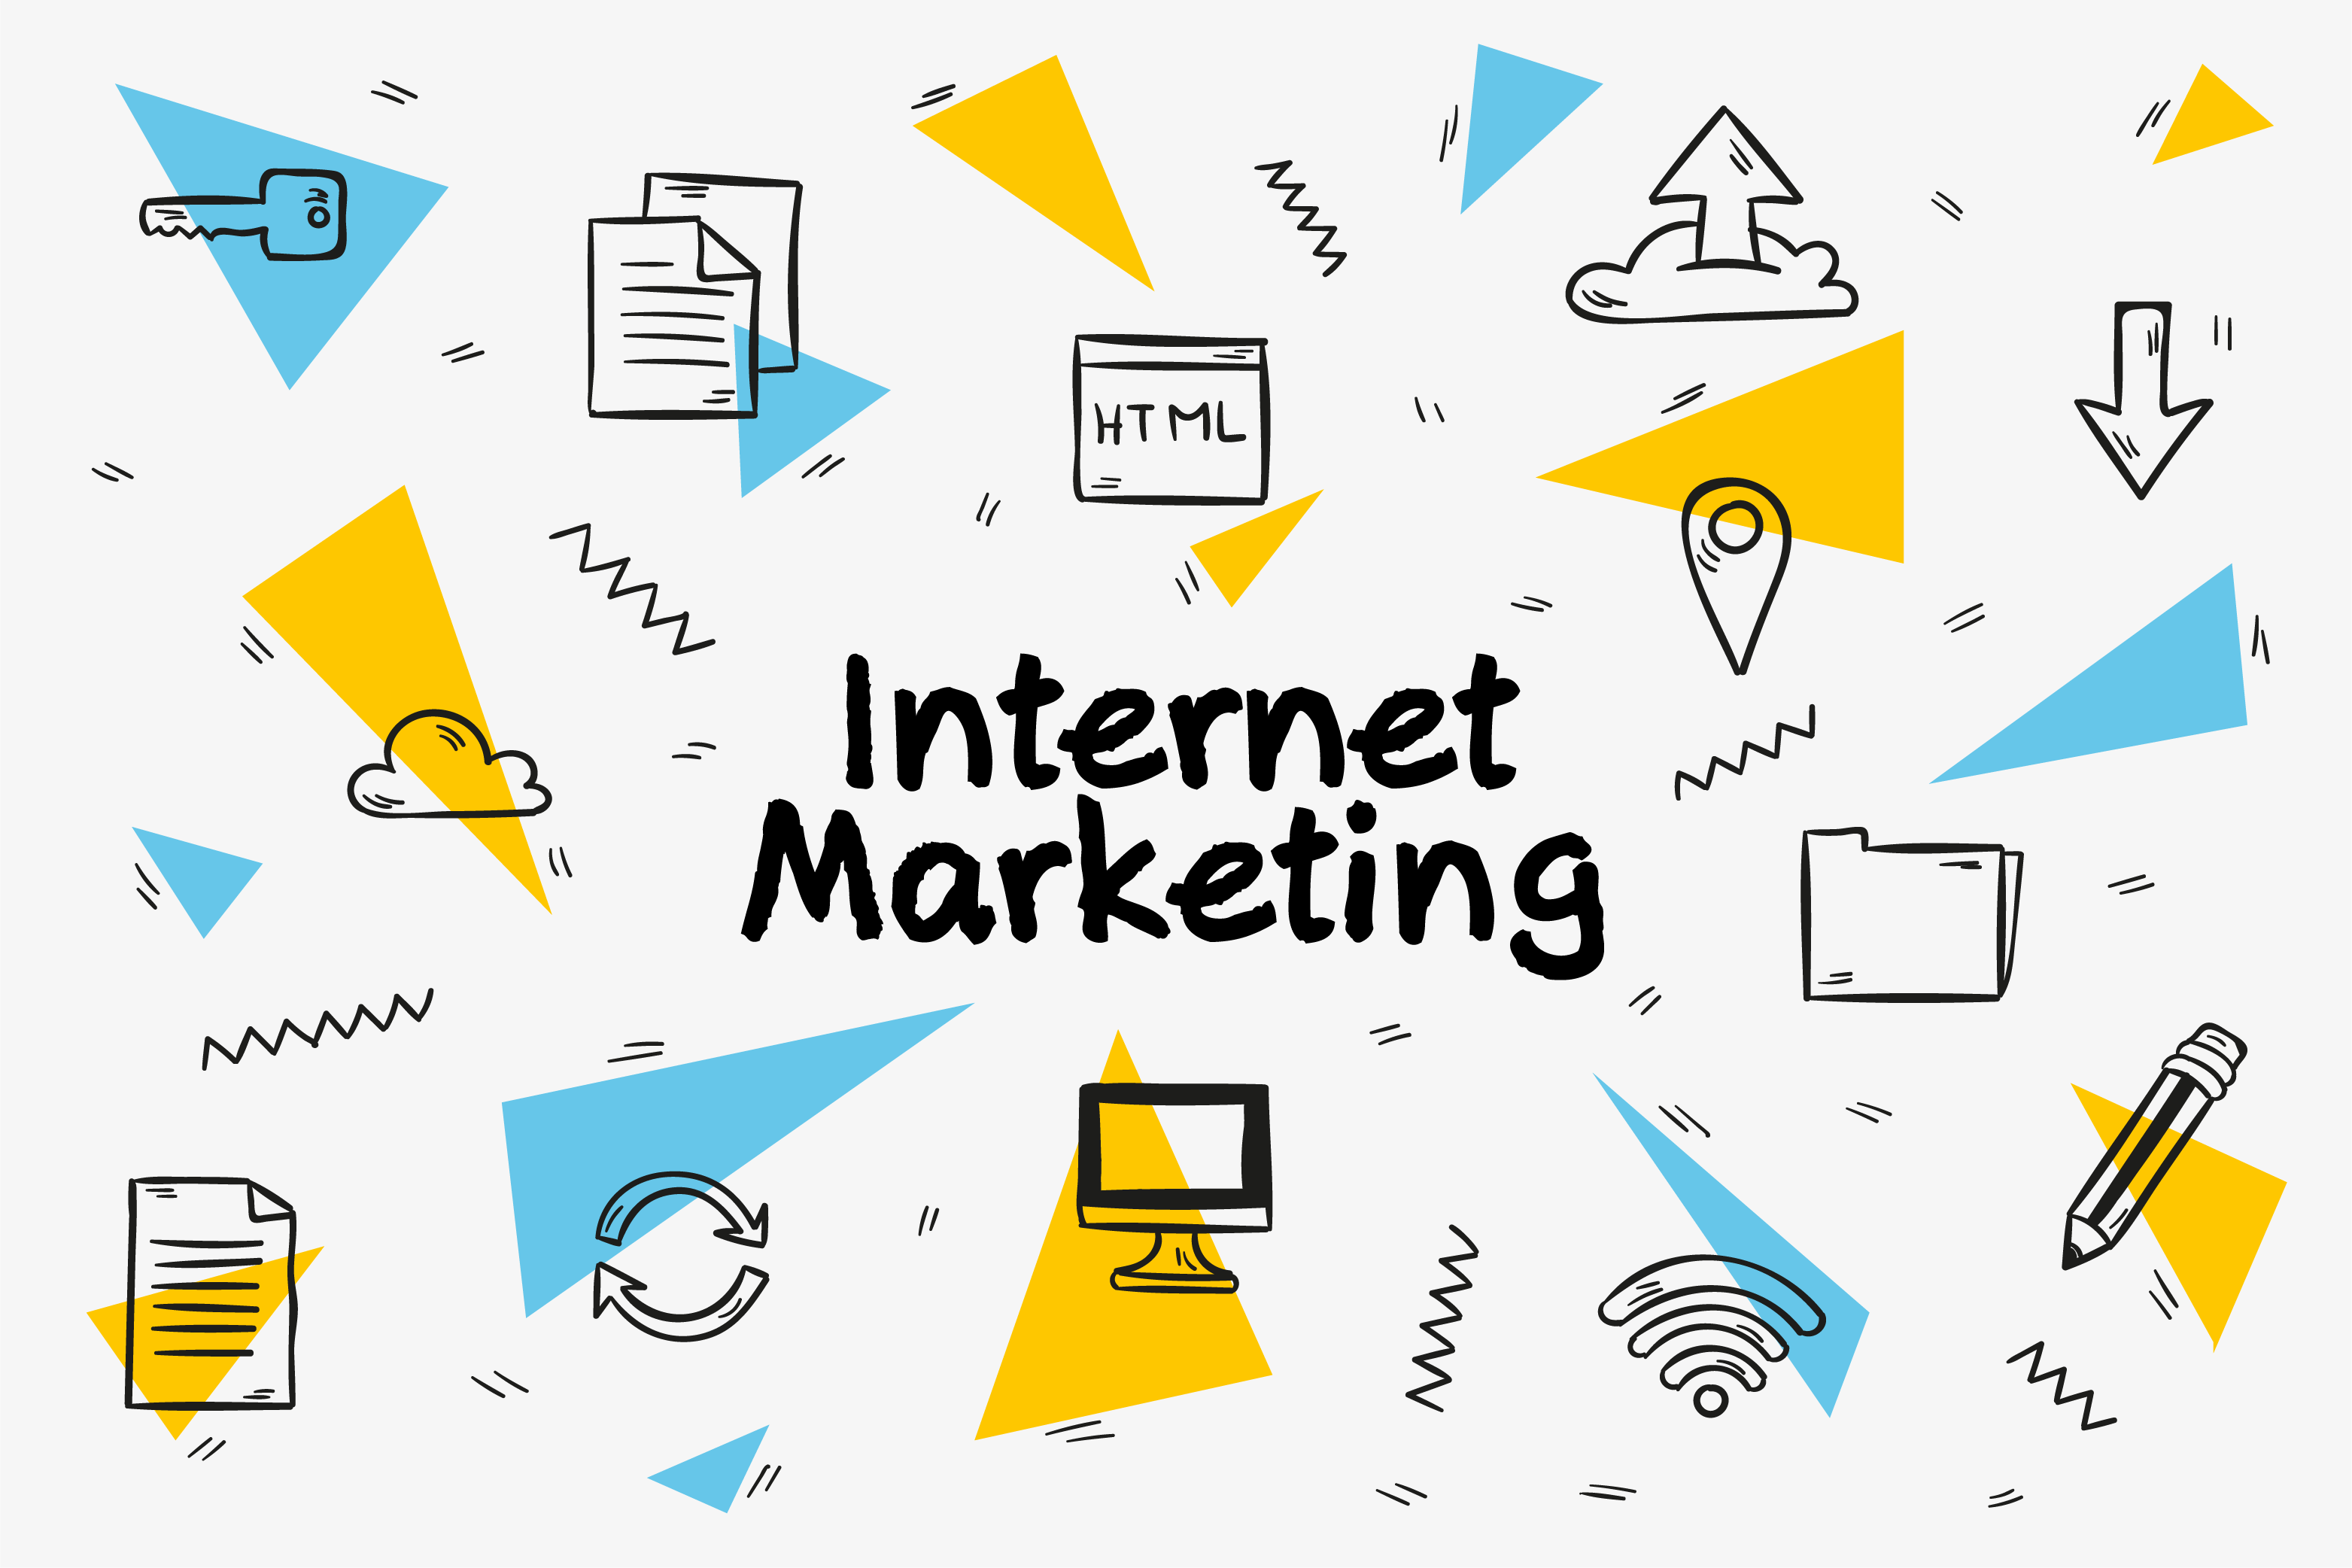 Top Digital Marketing Trends in 2018